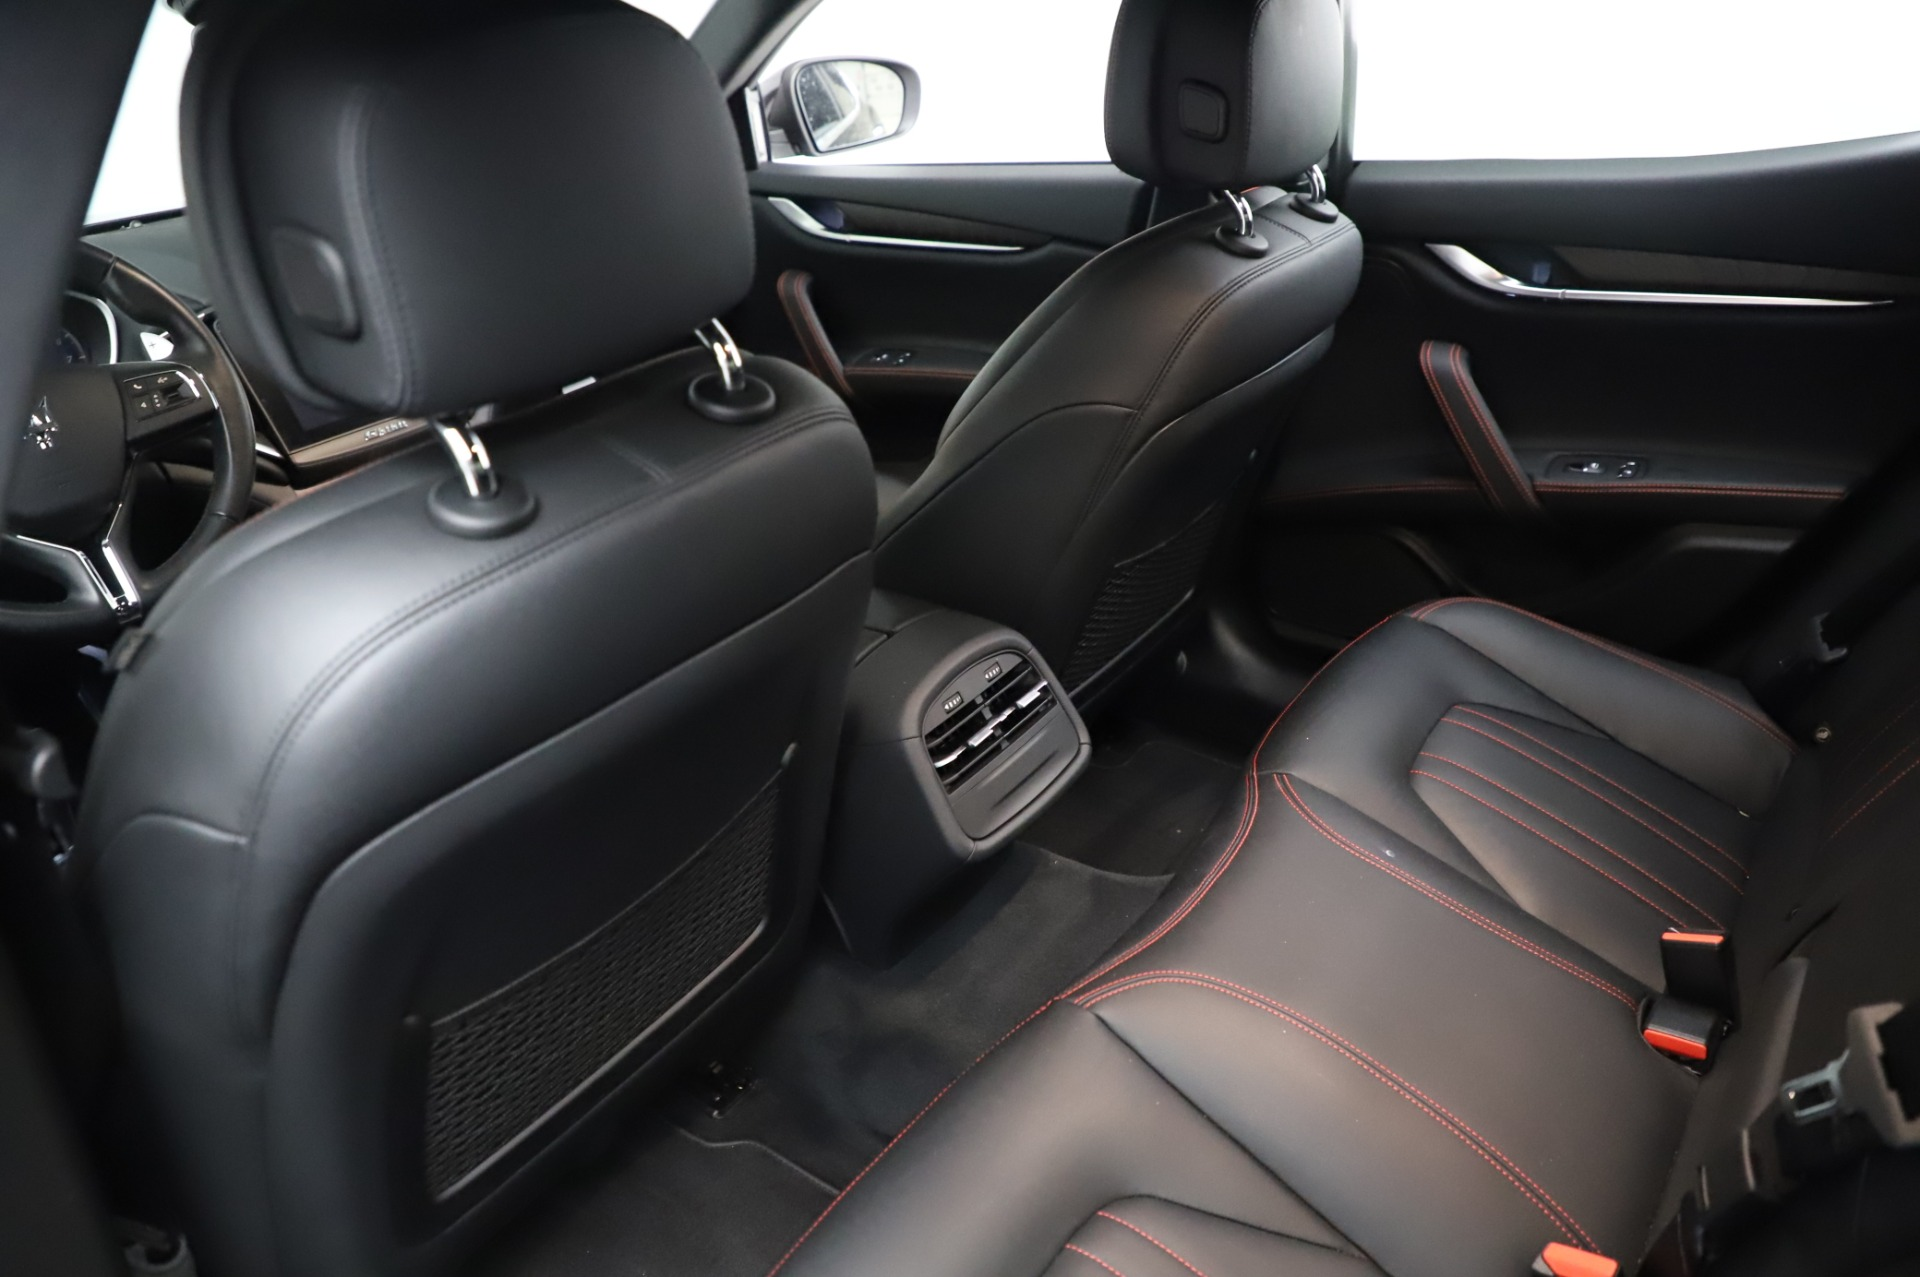 Used 2018 Maserati Ghibli S Q4 For Sale 86775 In Greenwich, CT